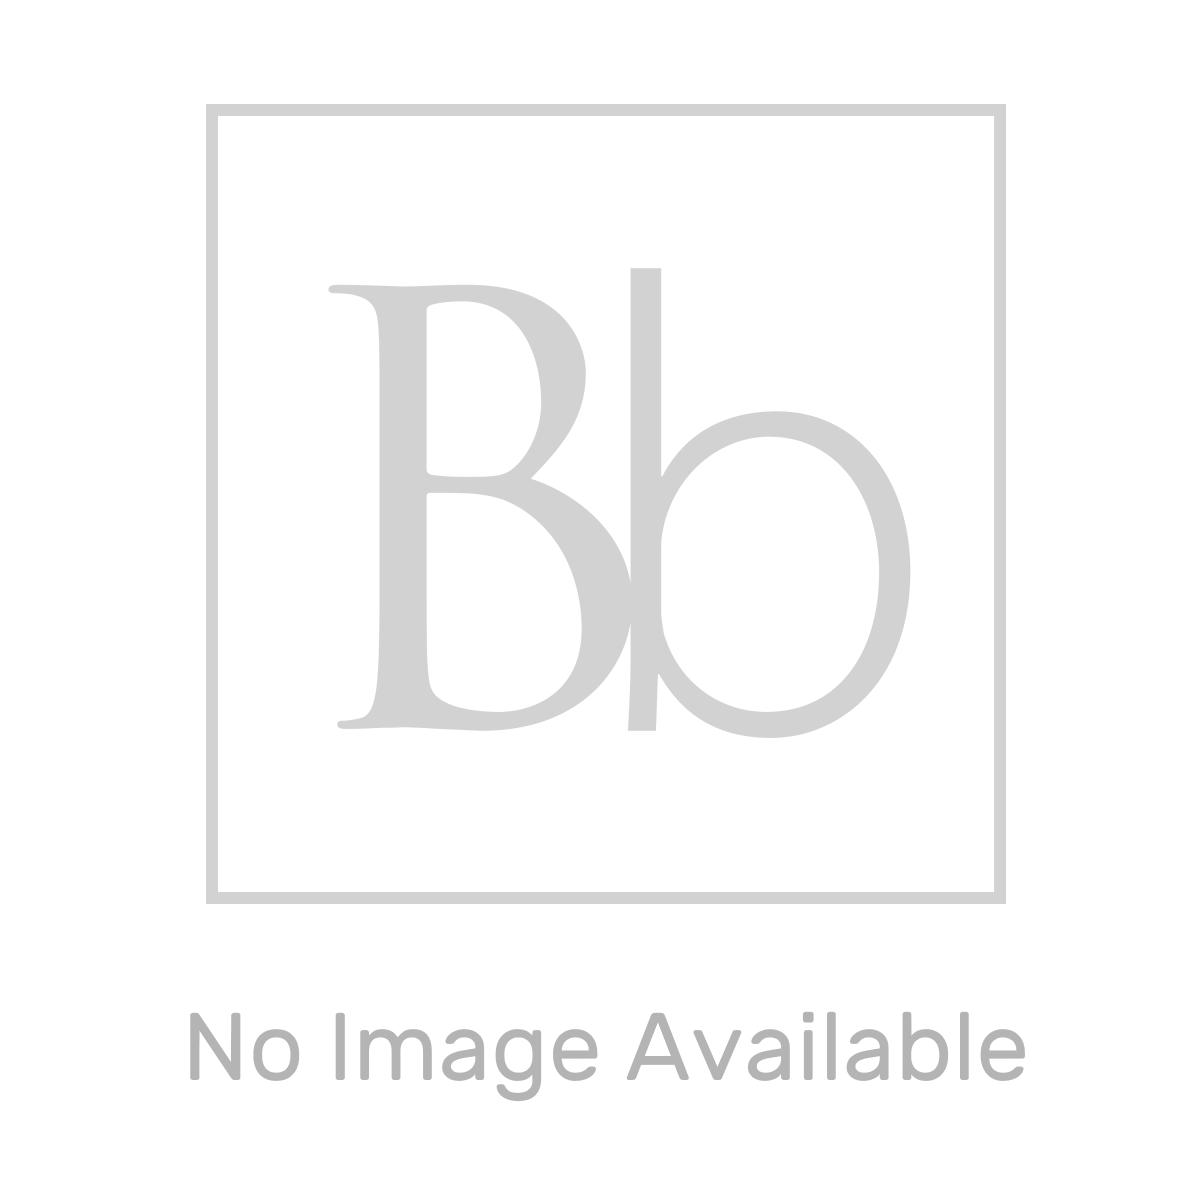 Hudson Reed Quartet Natural Oak Double Vanity Unit 1440mm